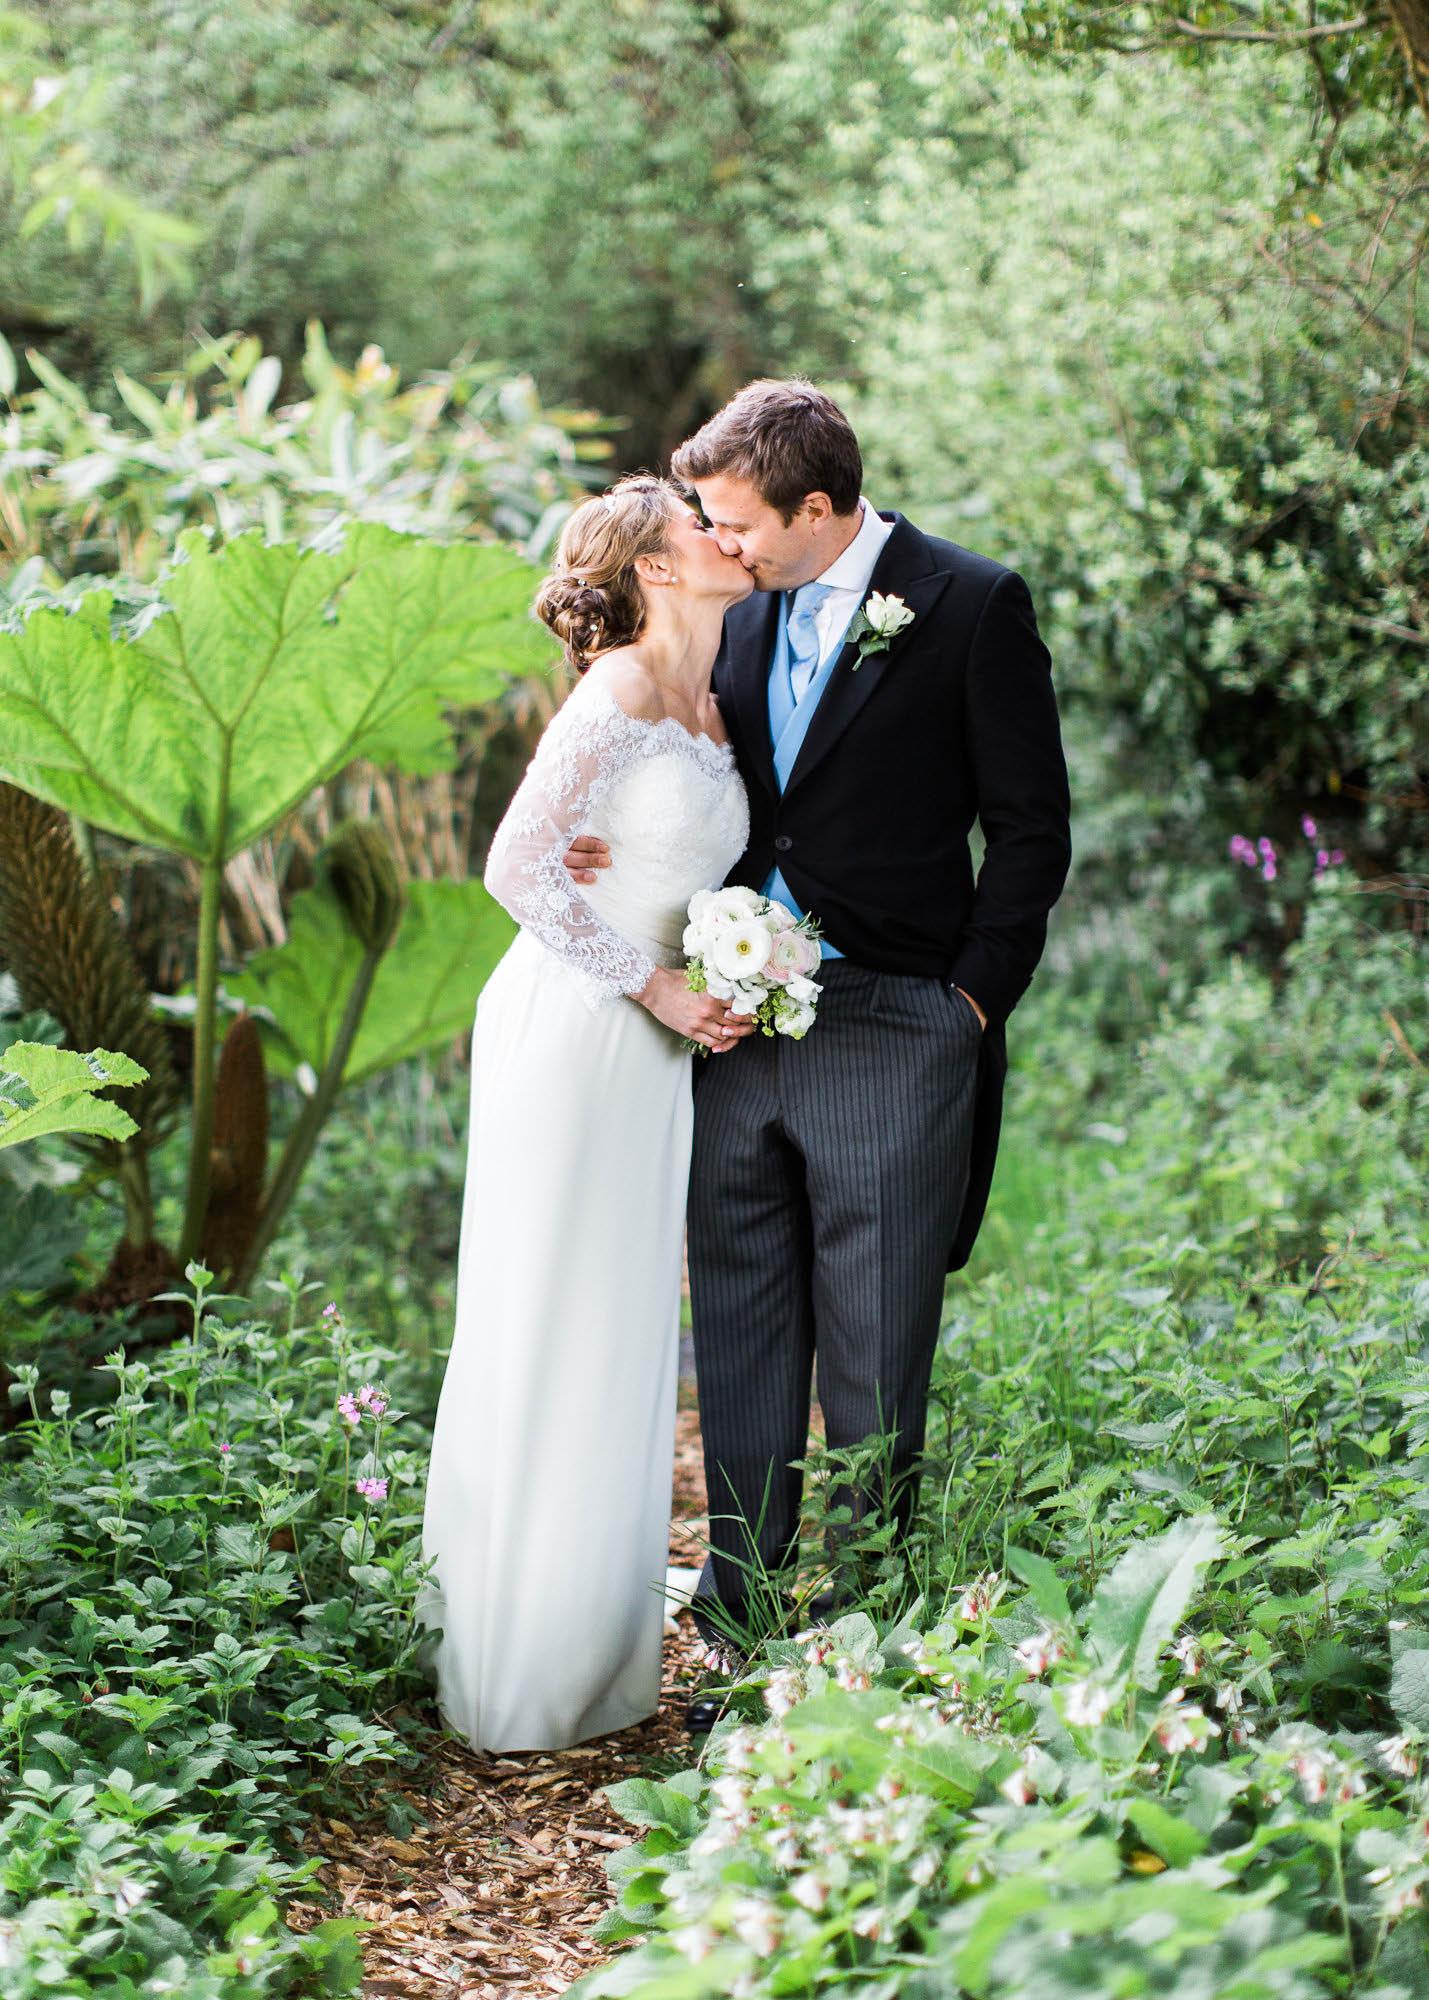 Amy O'Boyle Photography- Destination & UK Fine Art Film Wedding Photographer- English Countryside Wedding-18.jpg